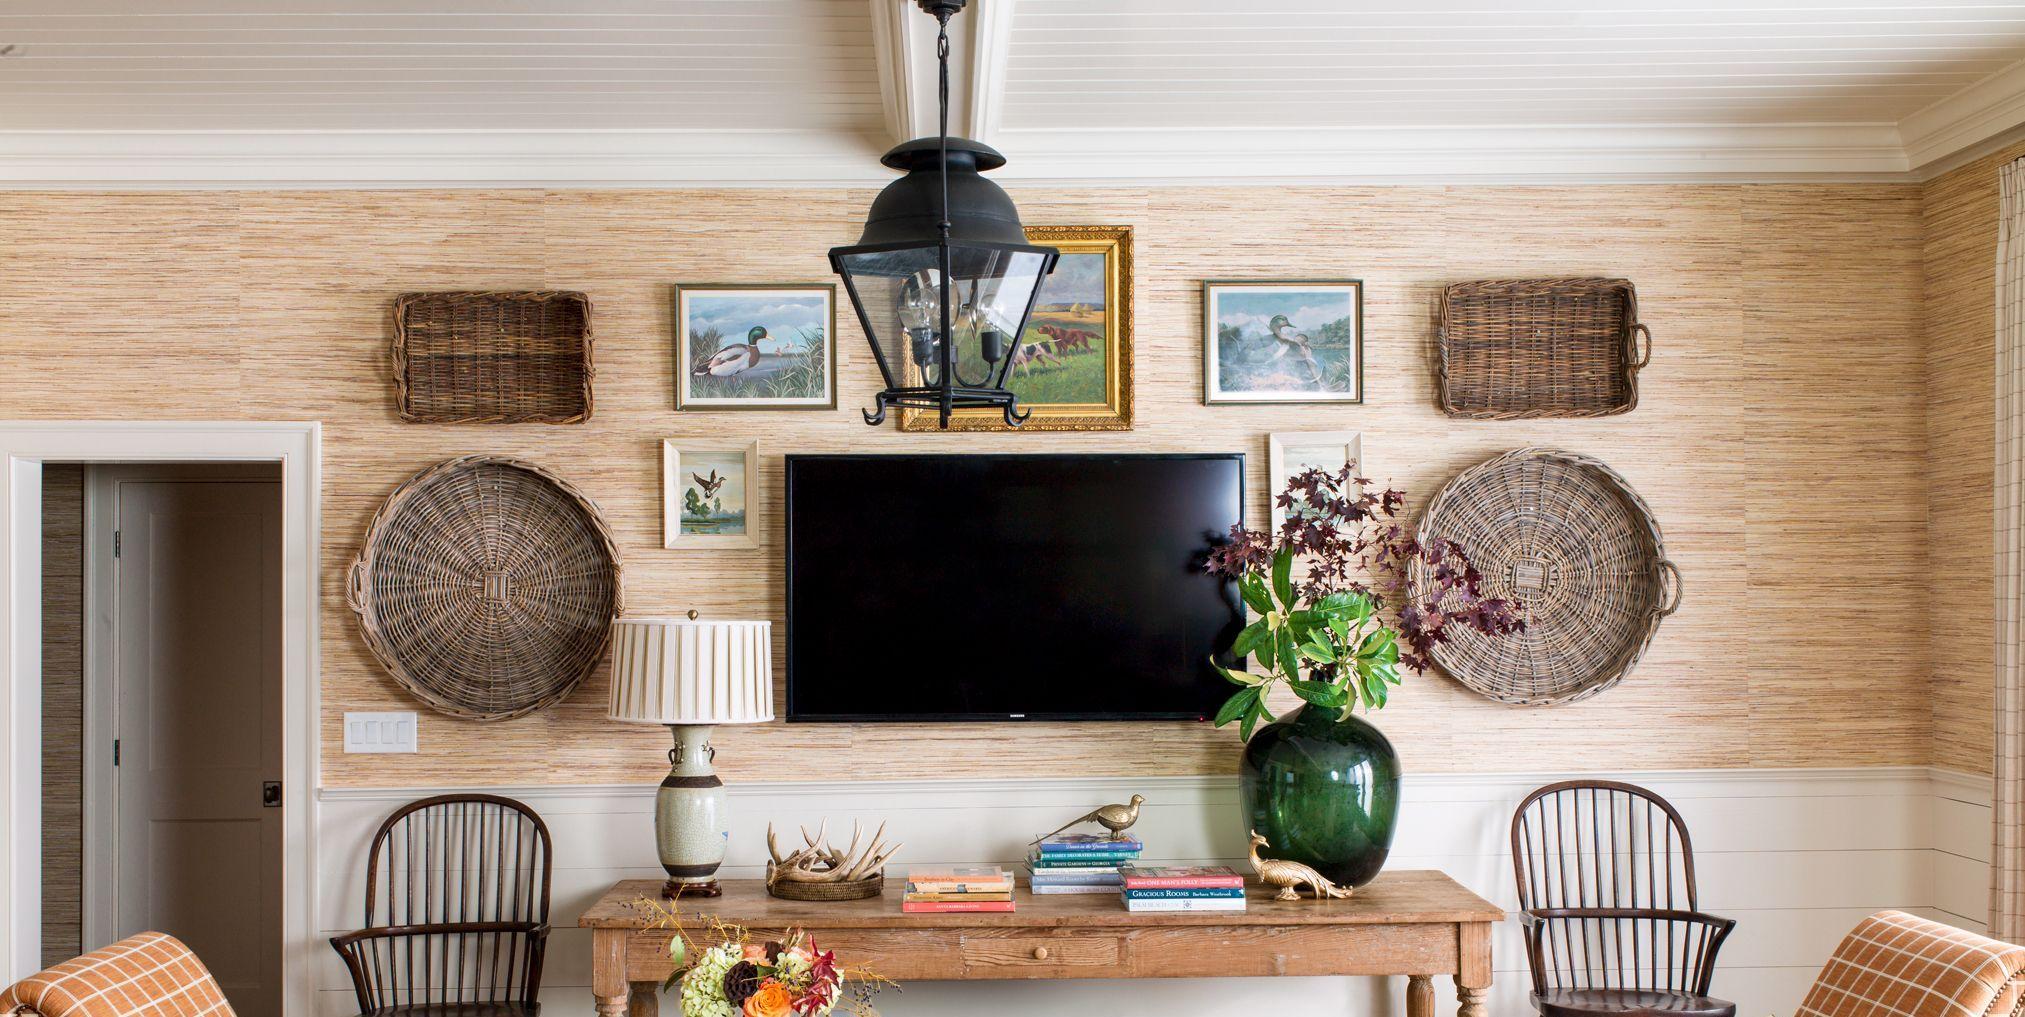 20 Family Room Decorating Ideas